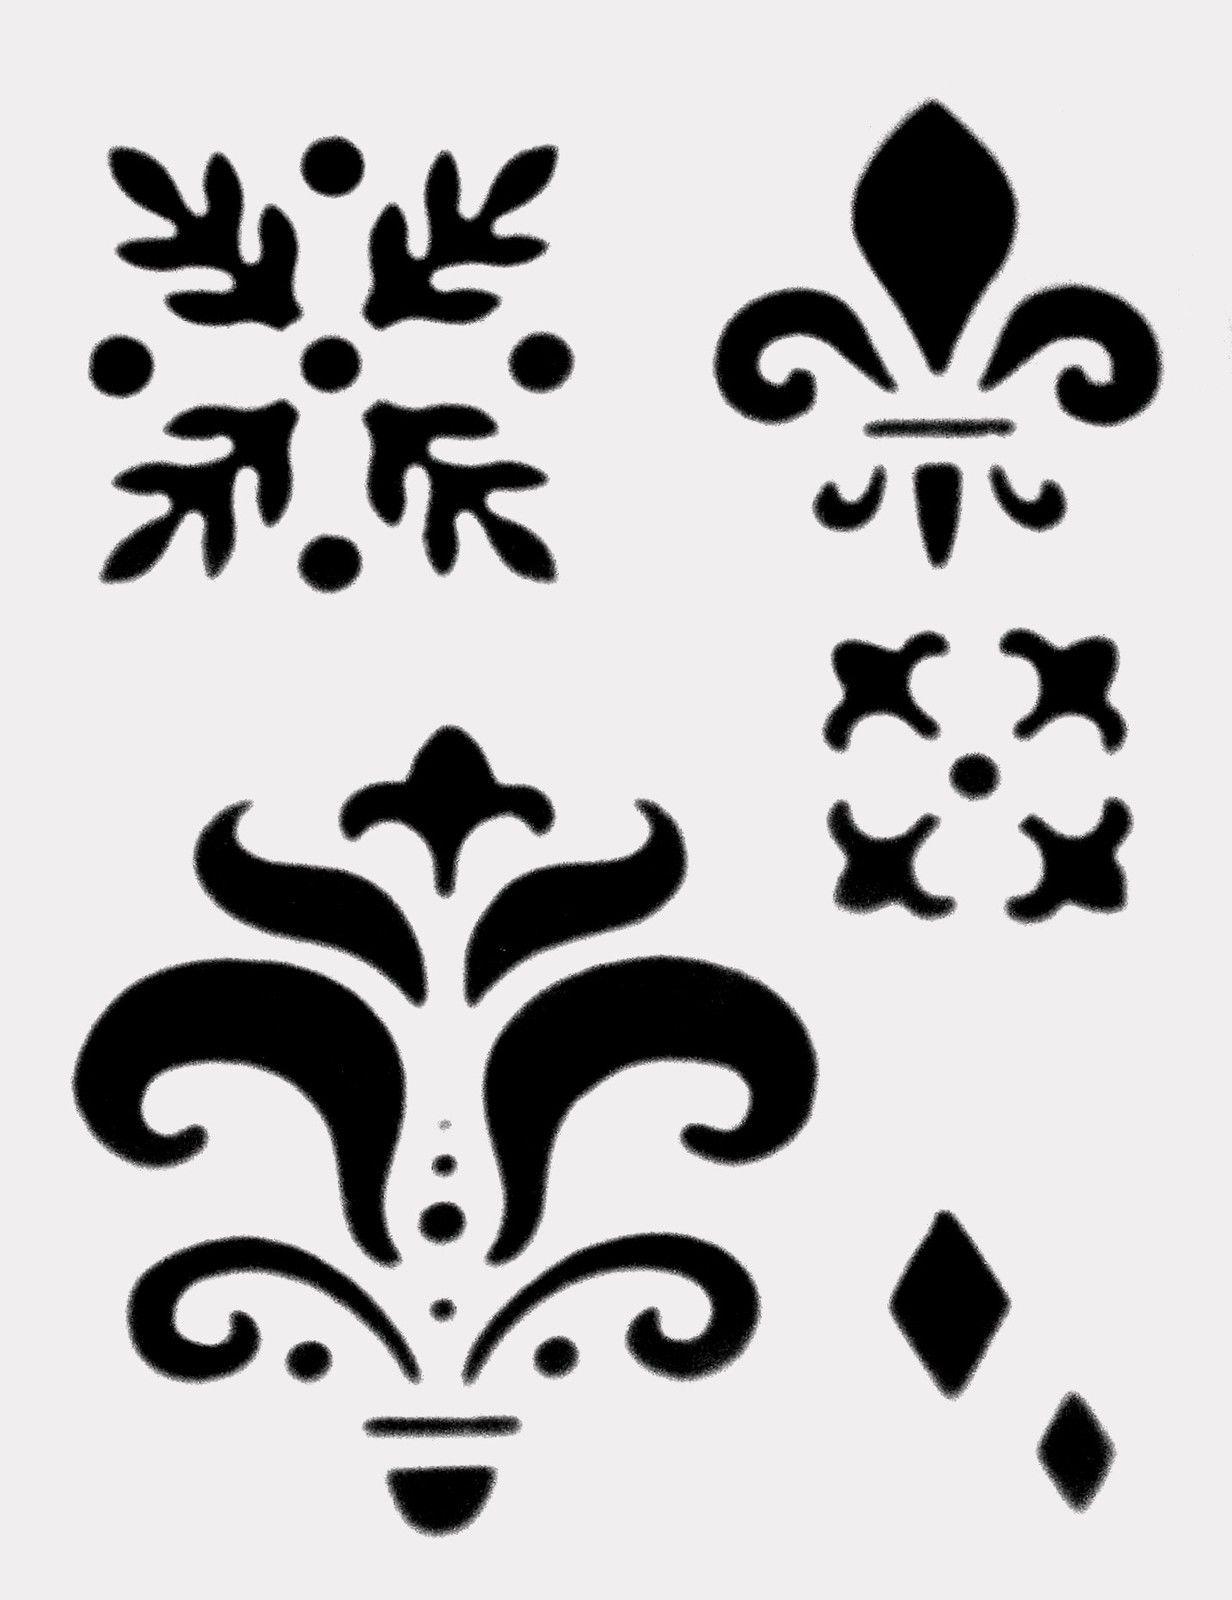 Free Saints Fleur De Lis Stencil, Download Free Clip Art, Free Clip - Damask Stencil Printable Free